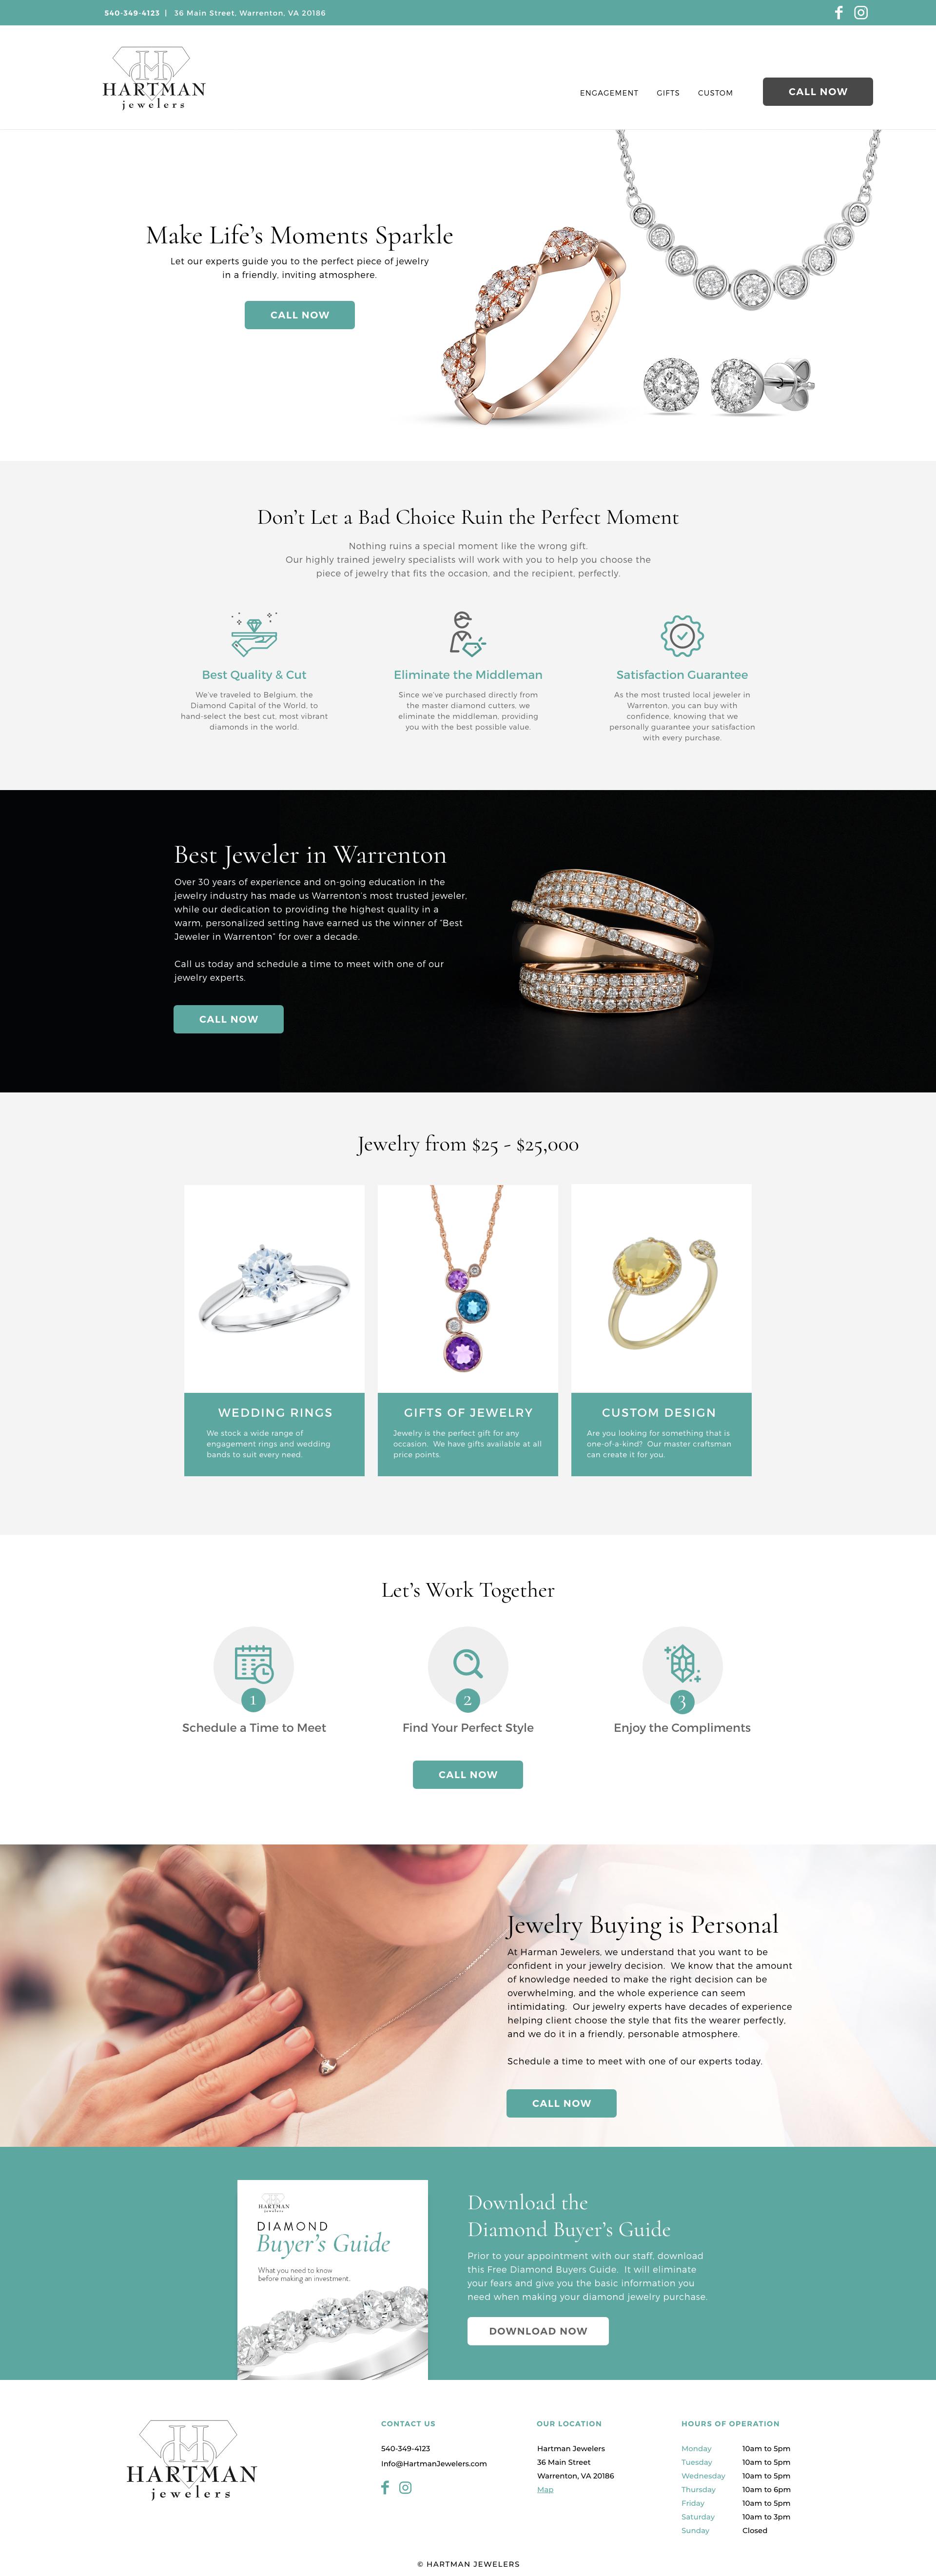 Hartman Jewelers